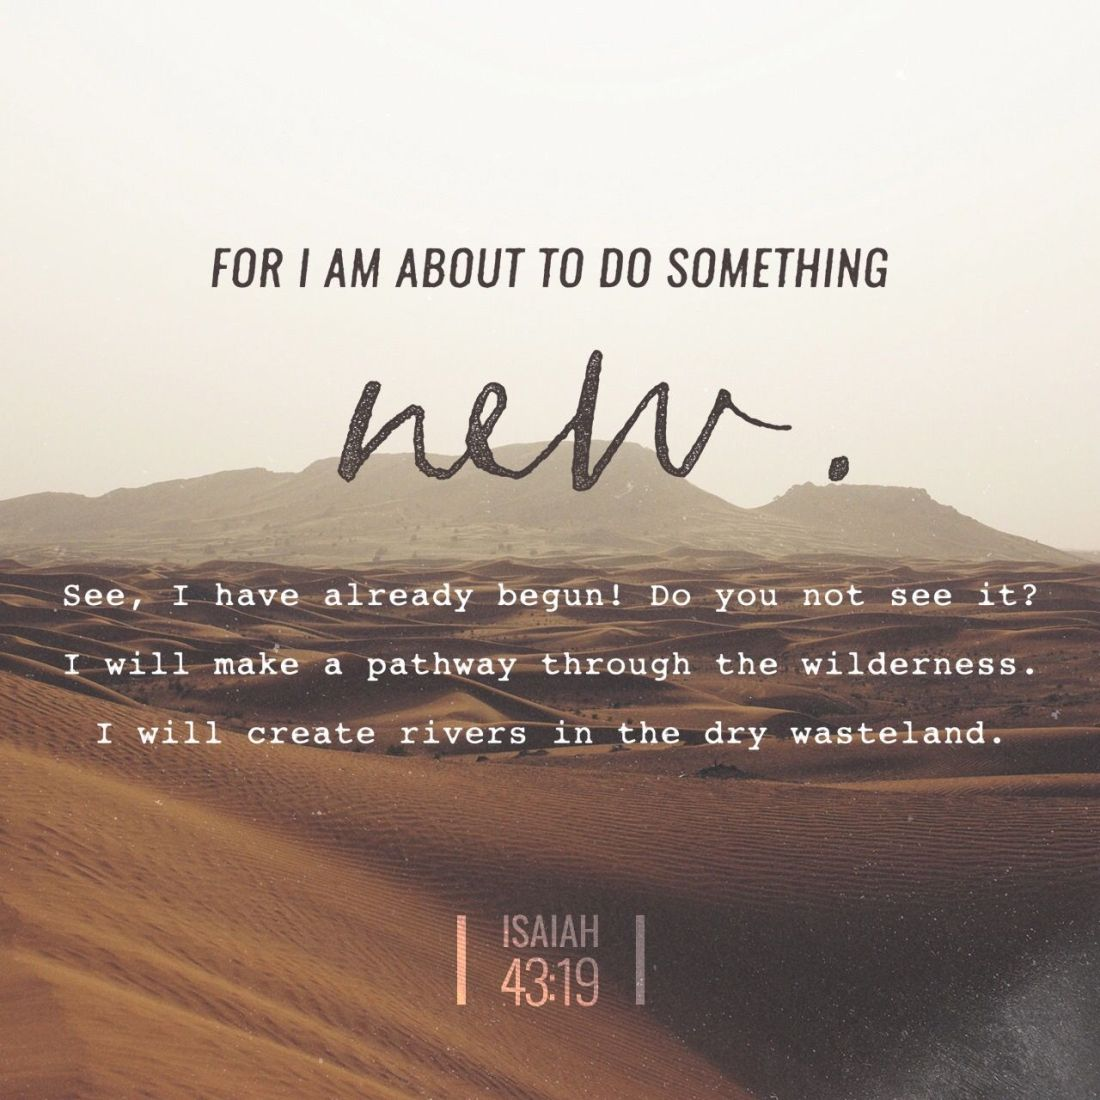 psalm 43 19.jpg